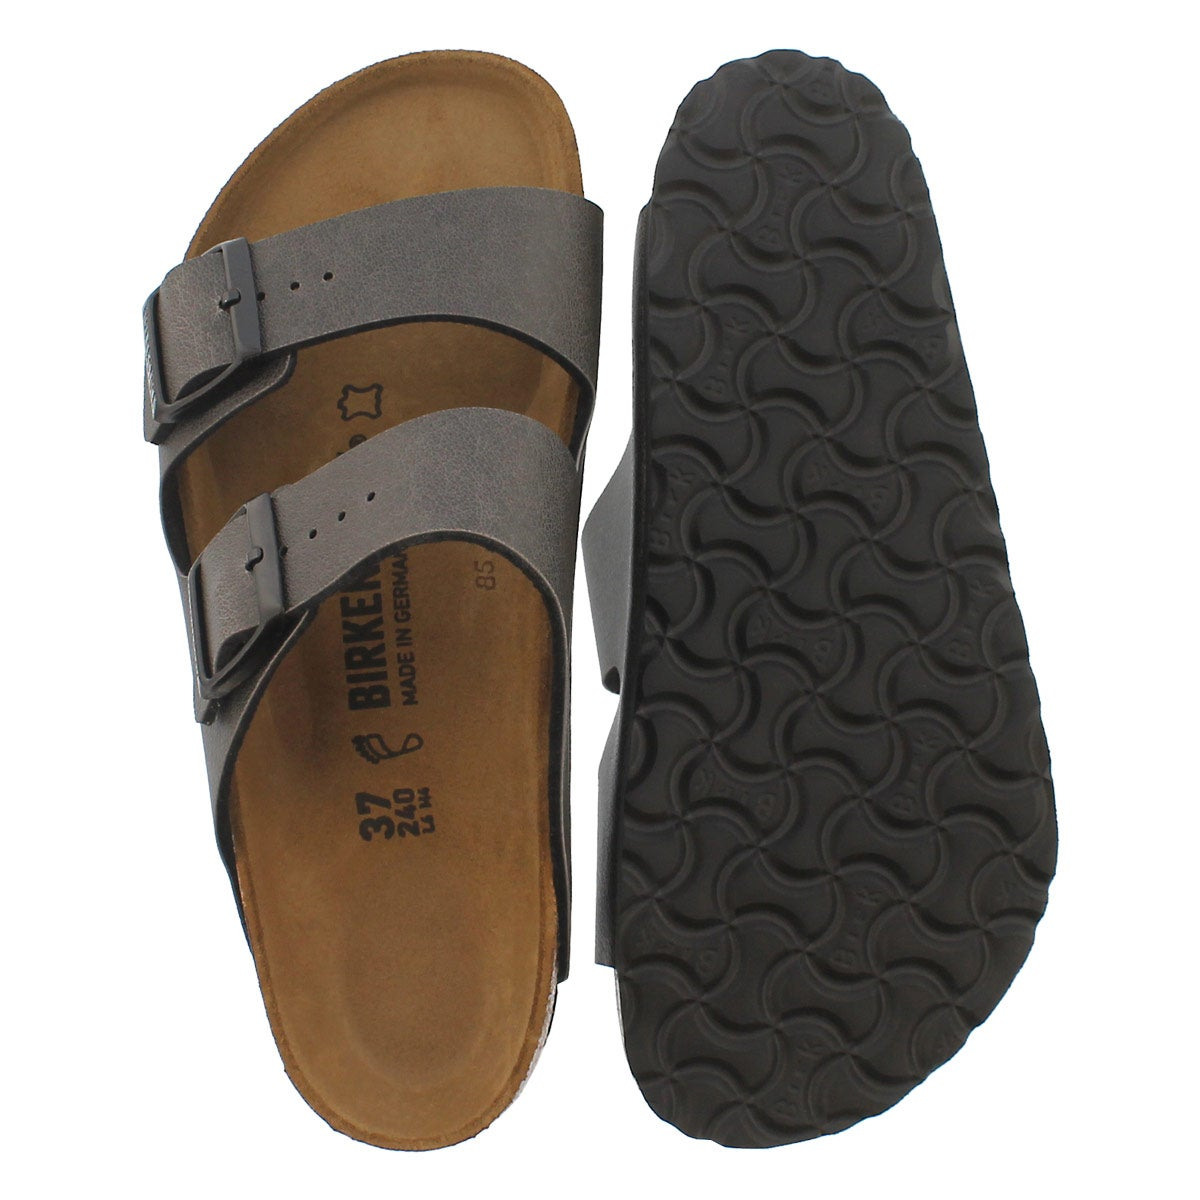 Lds Arizona anthracite BF 2 strap sandal